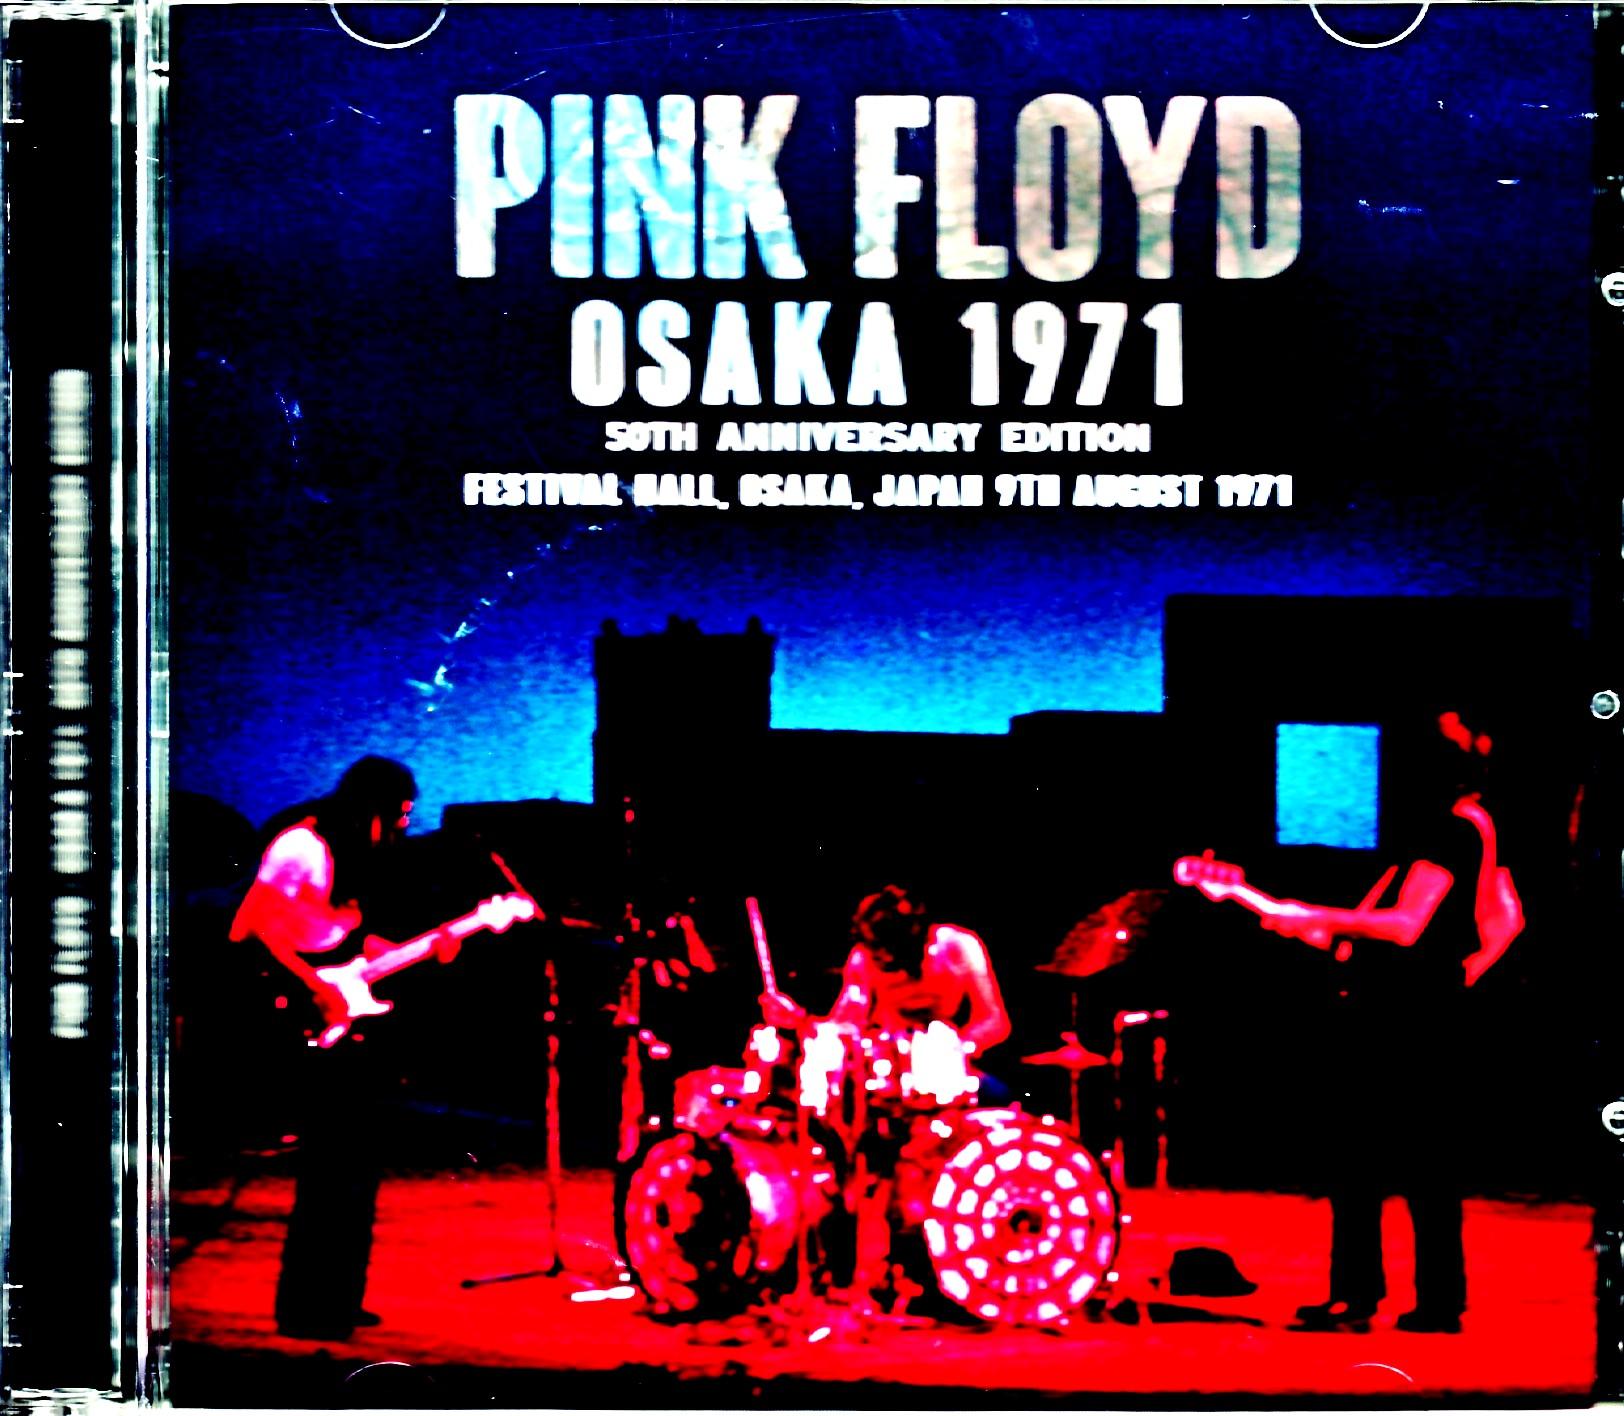 Pink Floyd ピンク・フロイド/Osaka,Japan 1971 Upgrade 50th Anniversary Edition